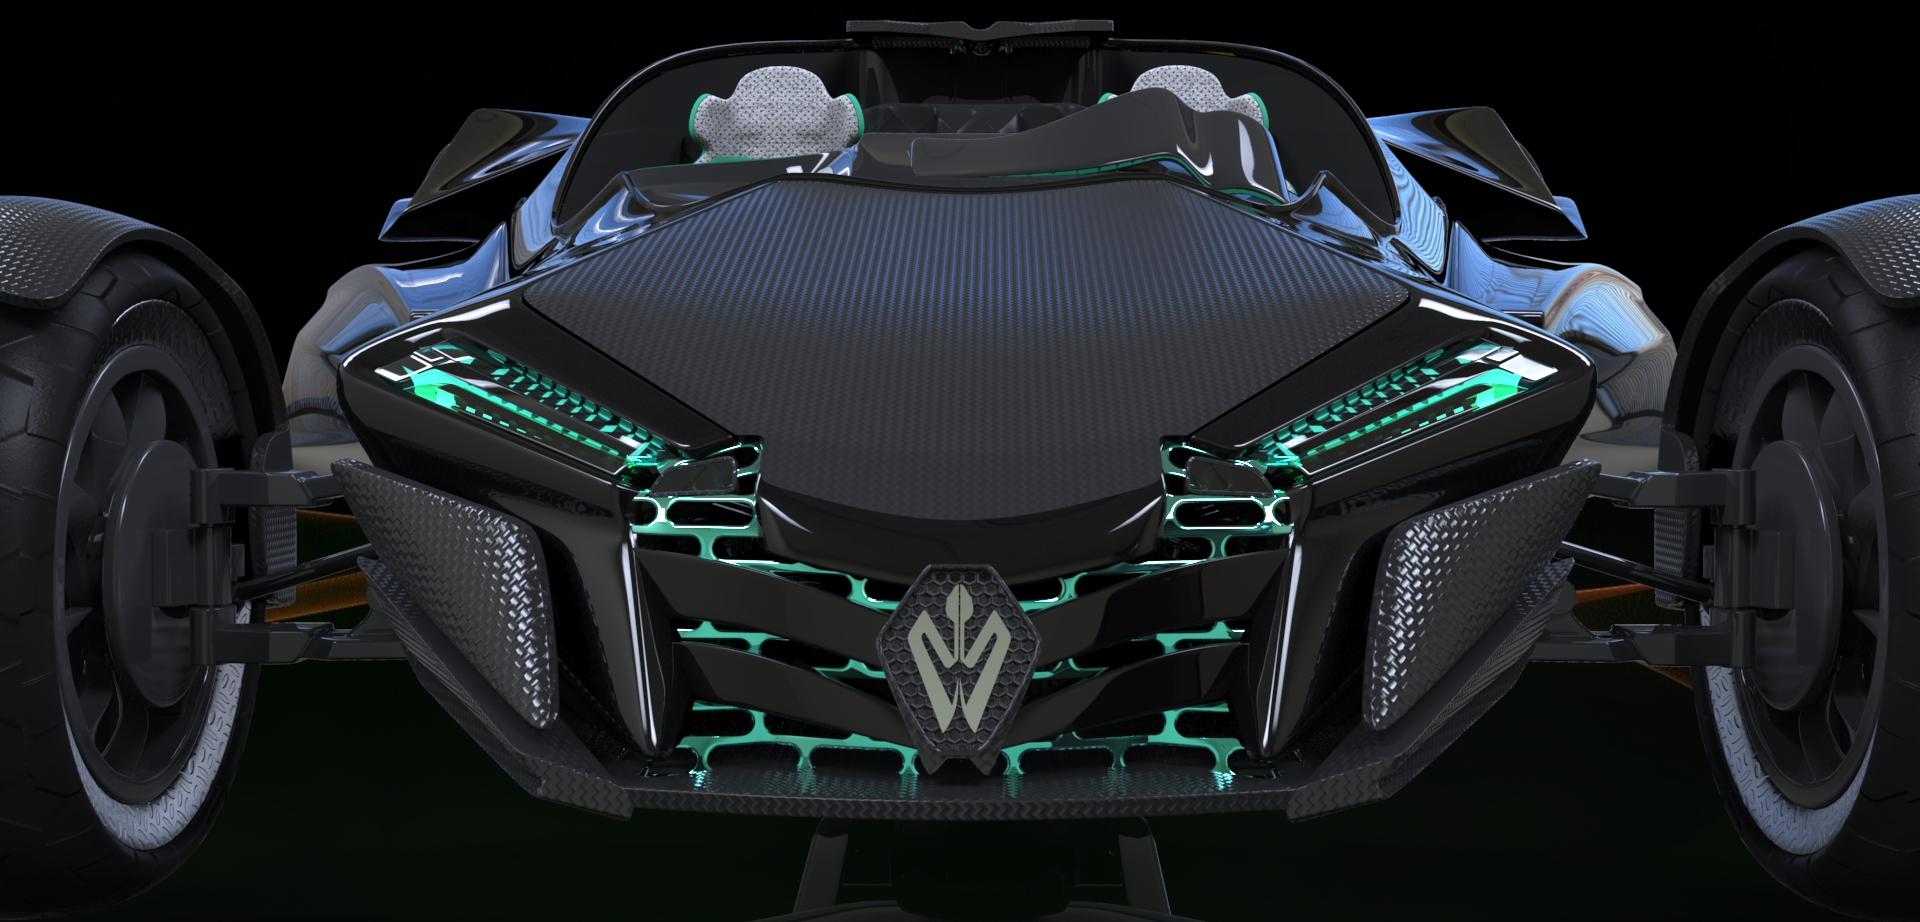 Trike Efa Concept By 7art 3docean